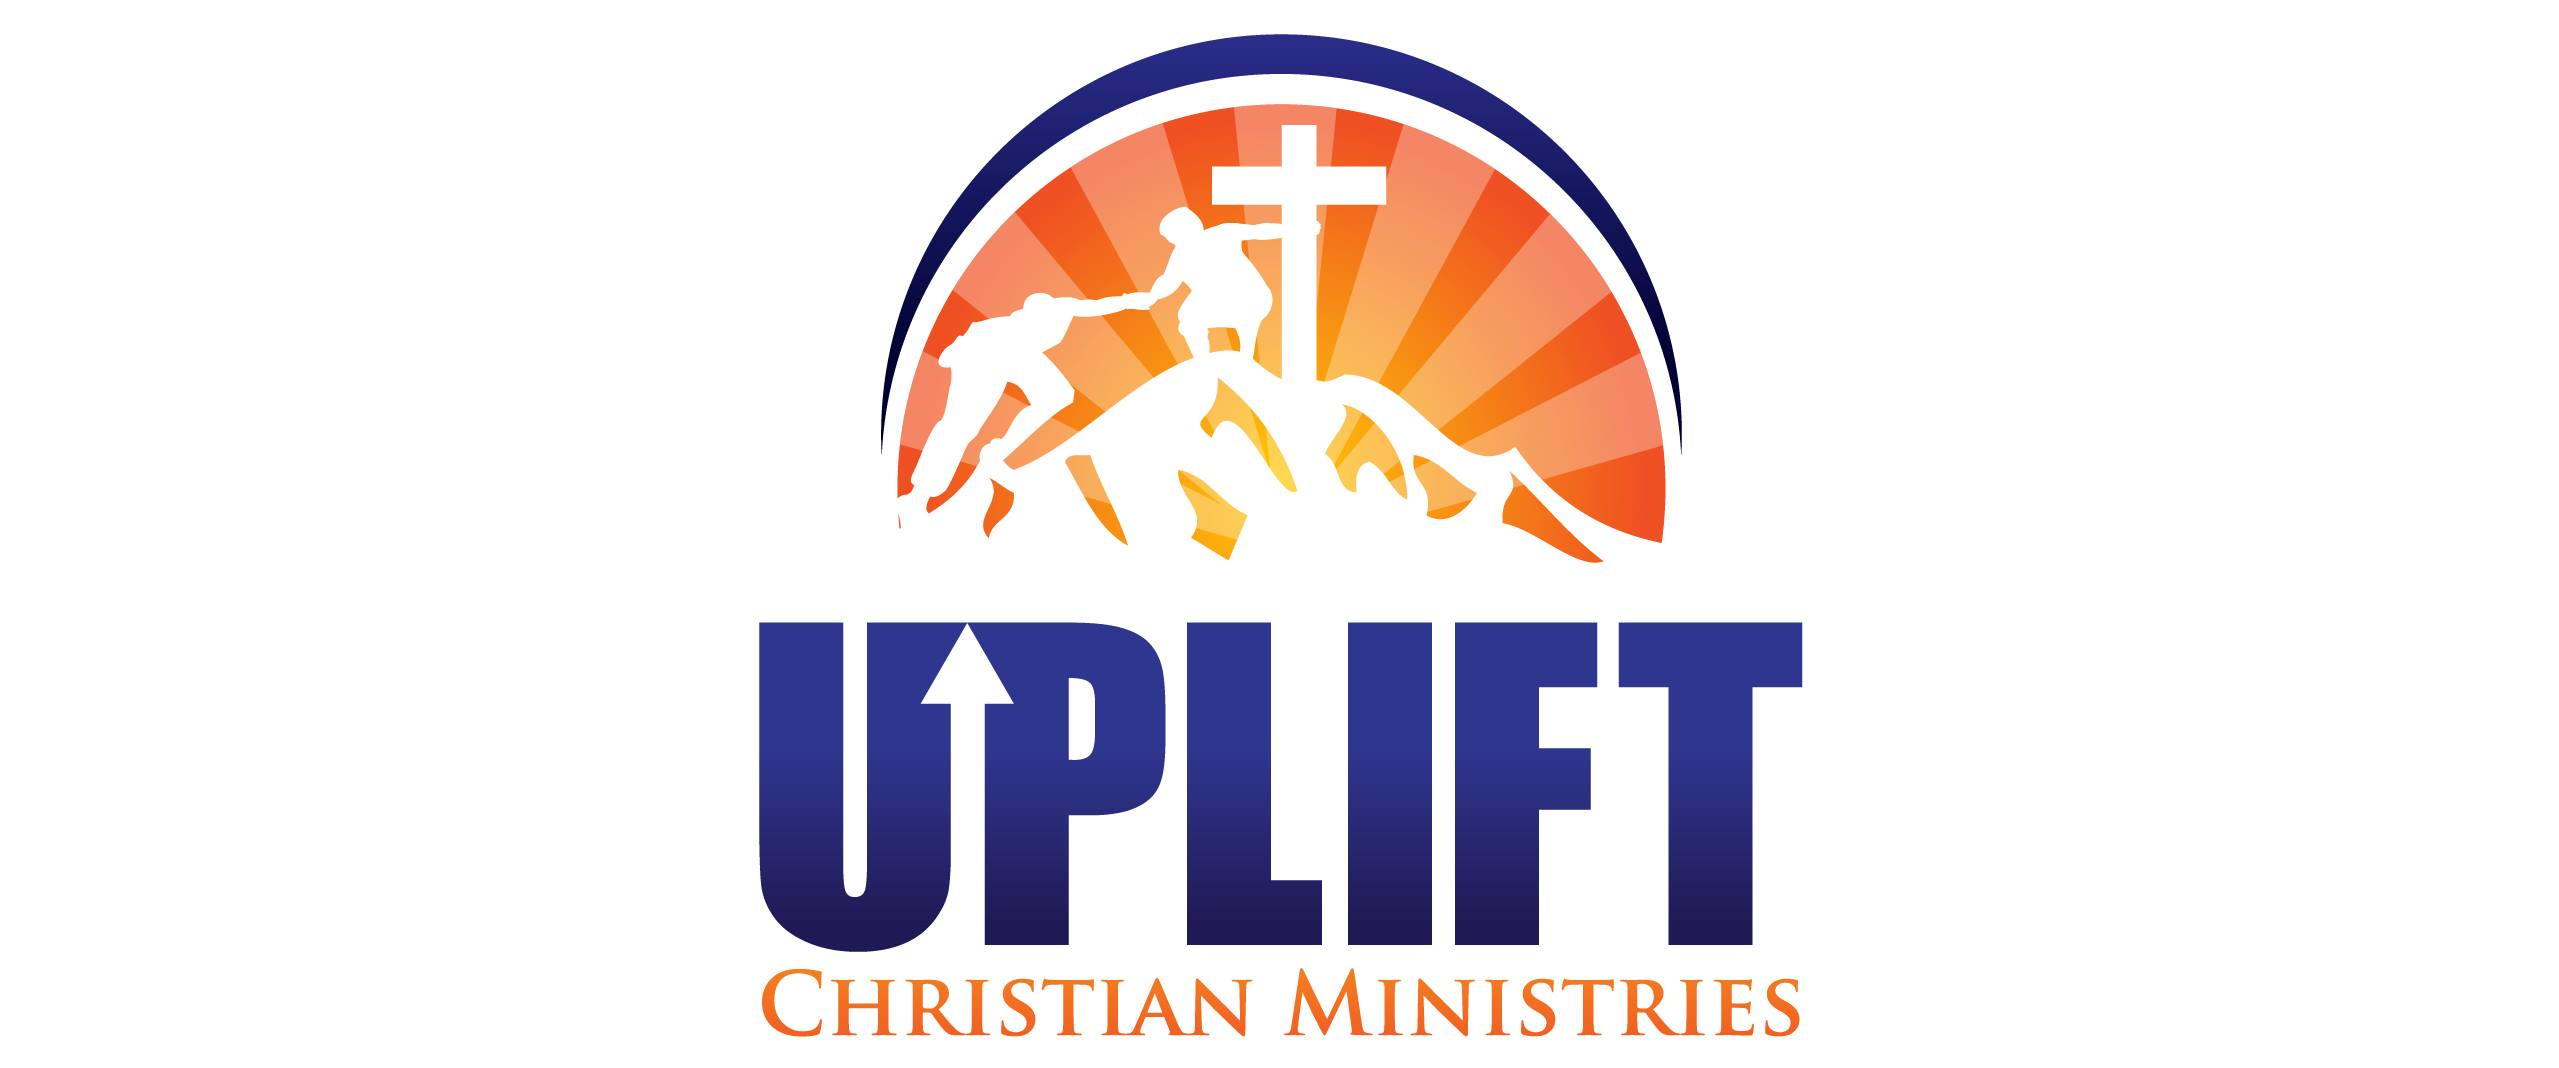 Uplift Community Food Pantry